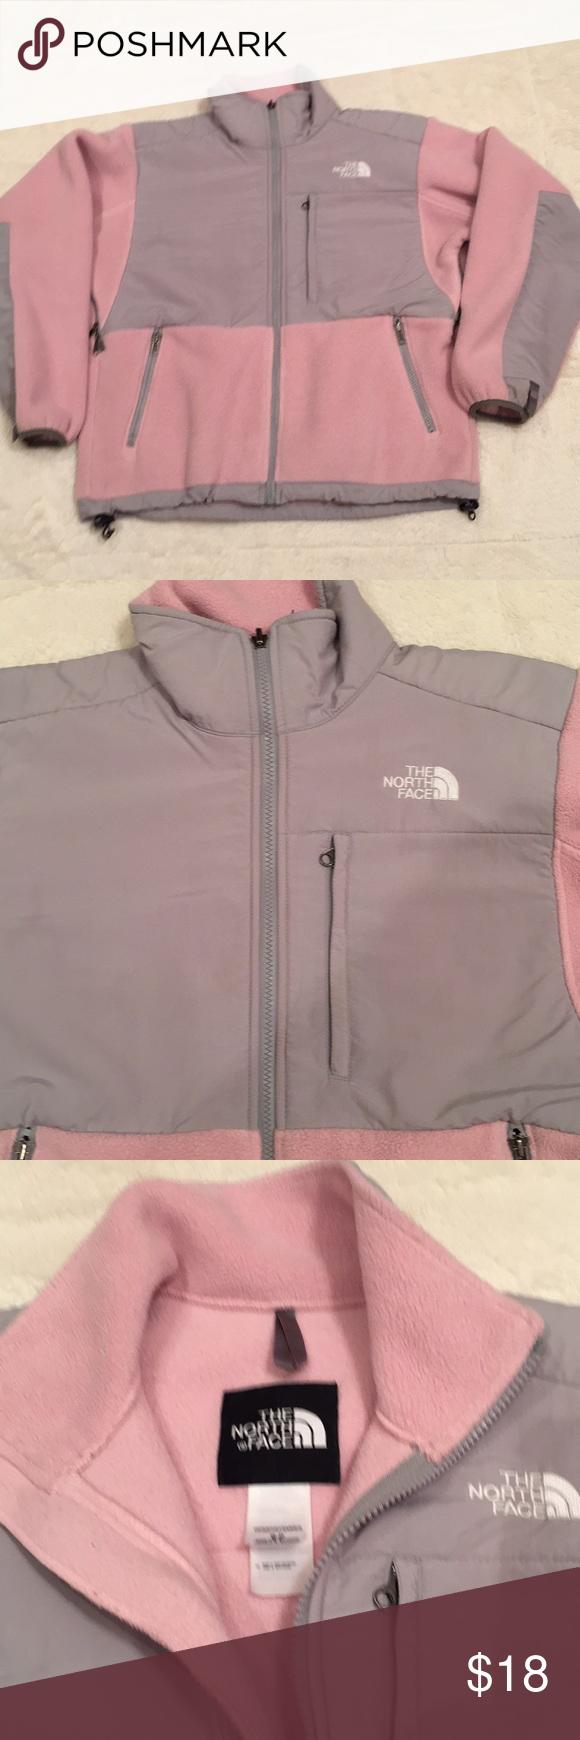 The North Face Zippered Fleece Jacket Fleece Jacket Jackets The North Face [ 1740 x 580 Pixel ]